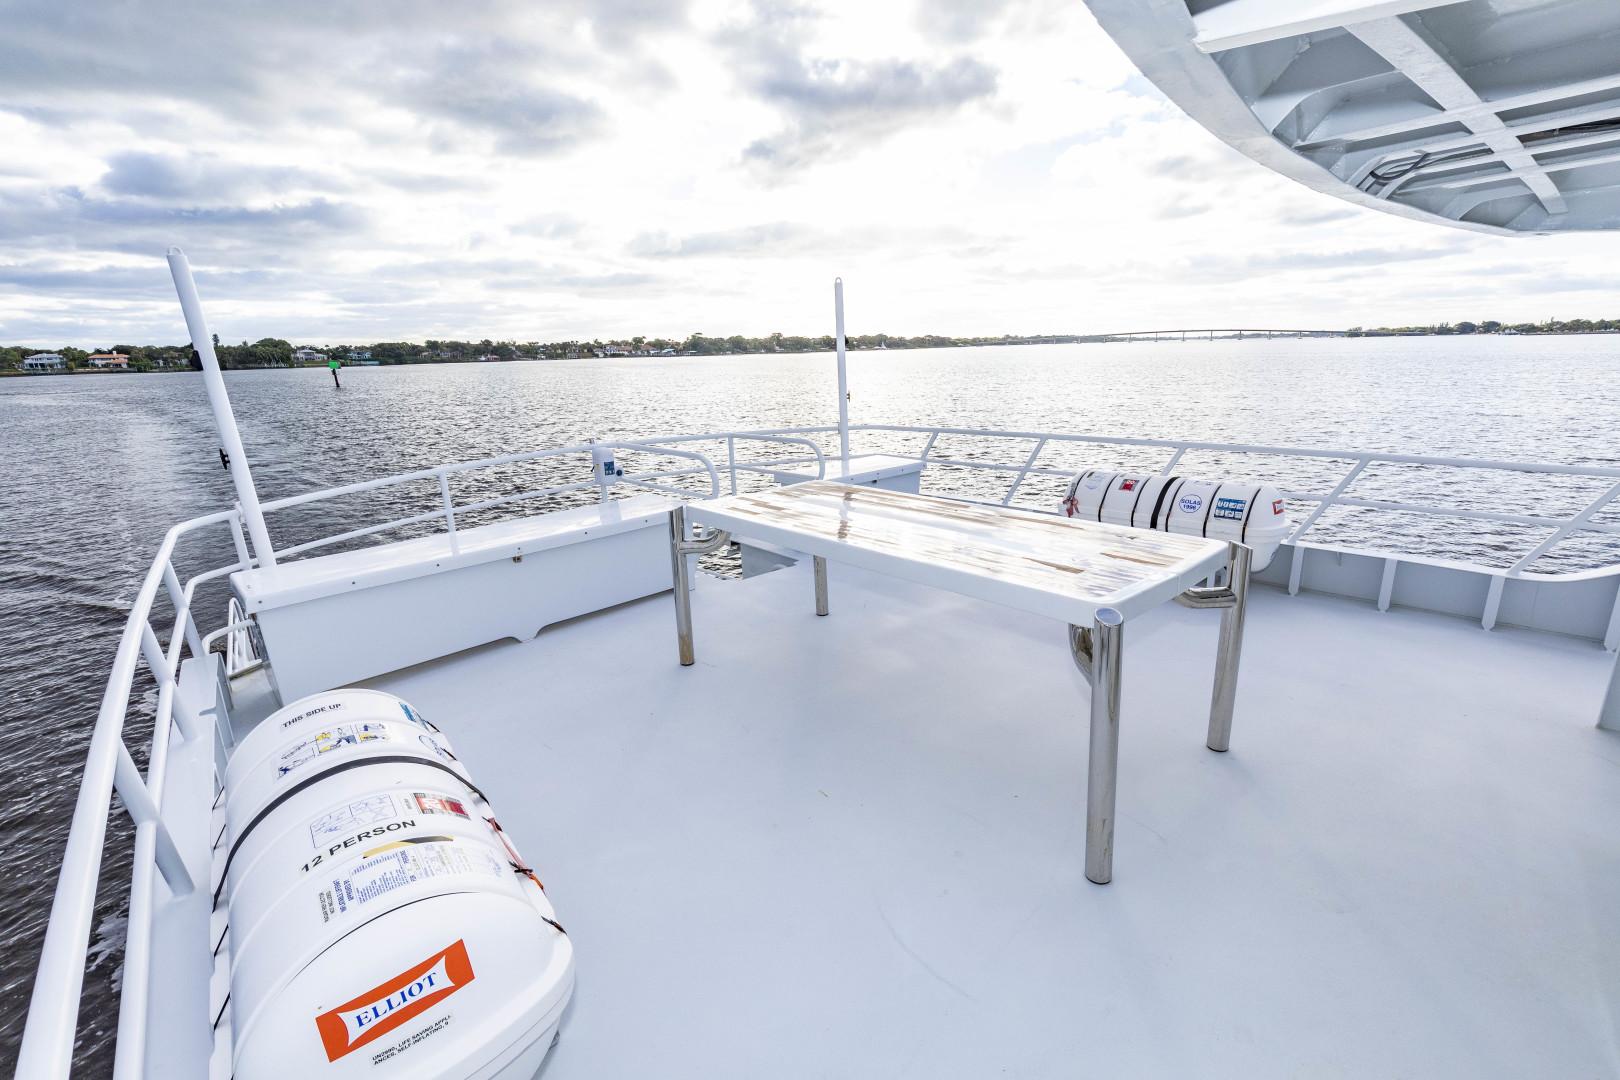 GlassTech-Expedition Yacht 2018-Reset Stuart-Florida-United States-Aft Deck-1568549 | Thumbnail